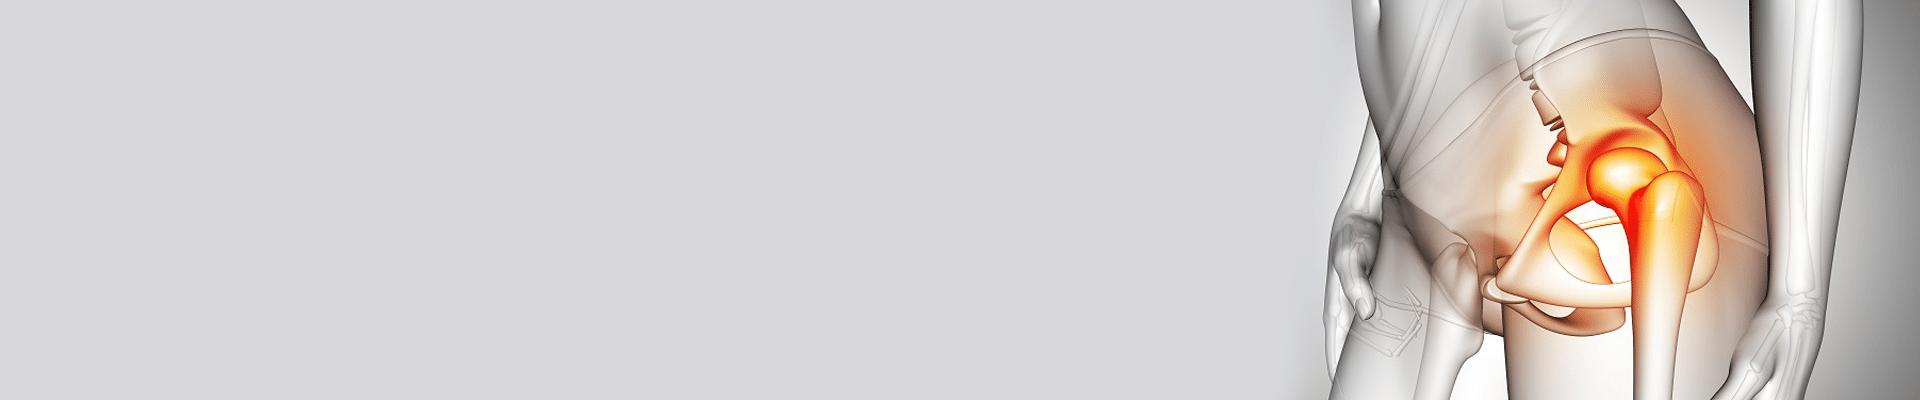 [:fr]Prothèse totale de la hanche Nabeul : prix PTH pas cher[:ar]التغيير الكلي للورك في نابل : بأسعر رخيصة :[:]